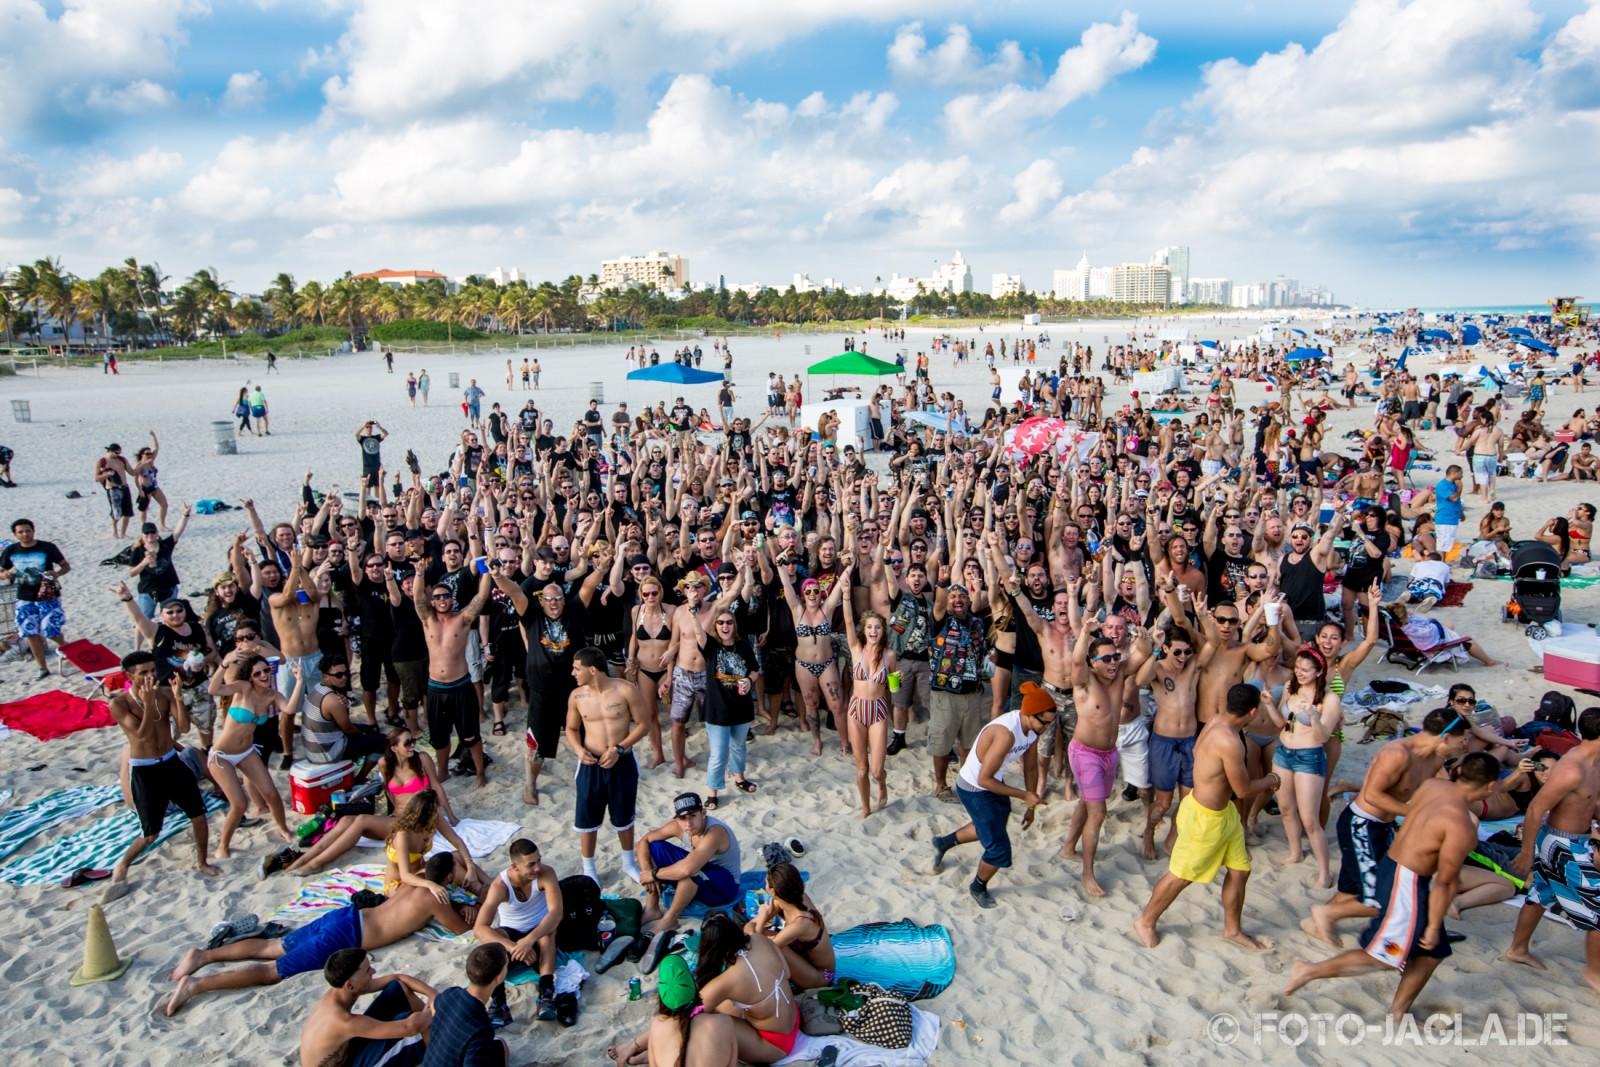 70000 Tons of Metal 2013 ::. Beachparty @ South Beach, Miami ::. http://www.foto-jagla.de